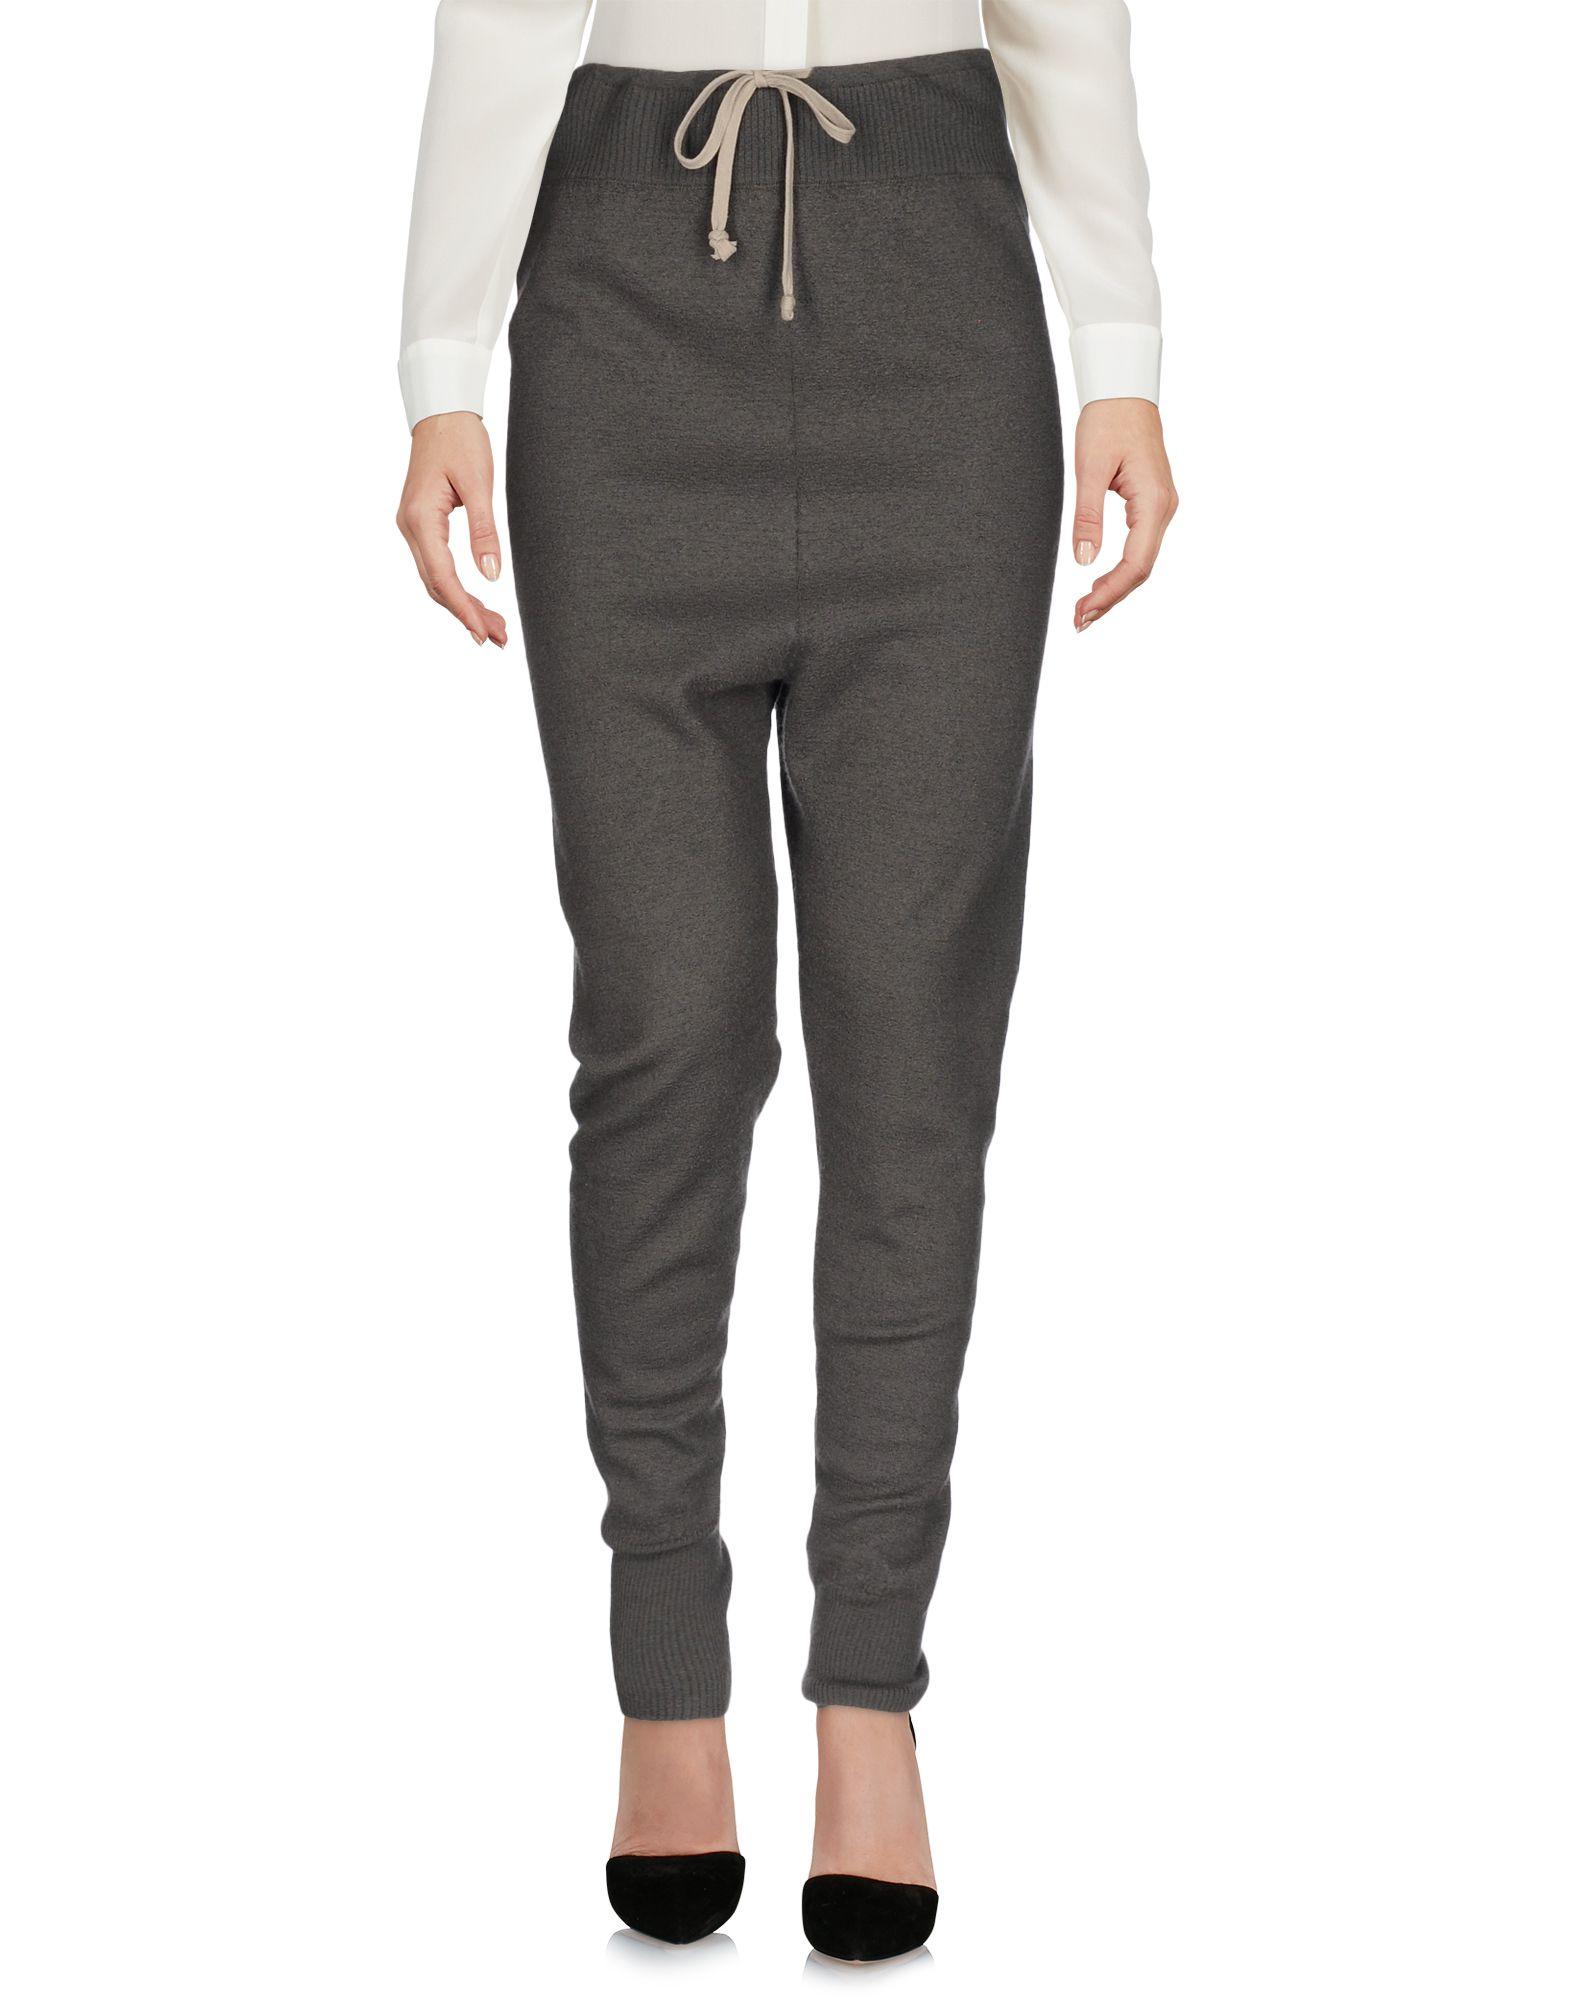 RICK OWENS Damen Hose Farbe Grau Größe 6 - broschei